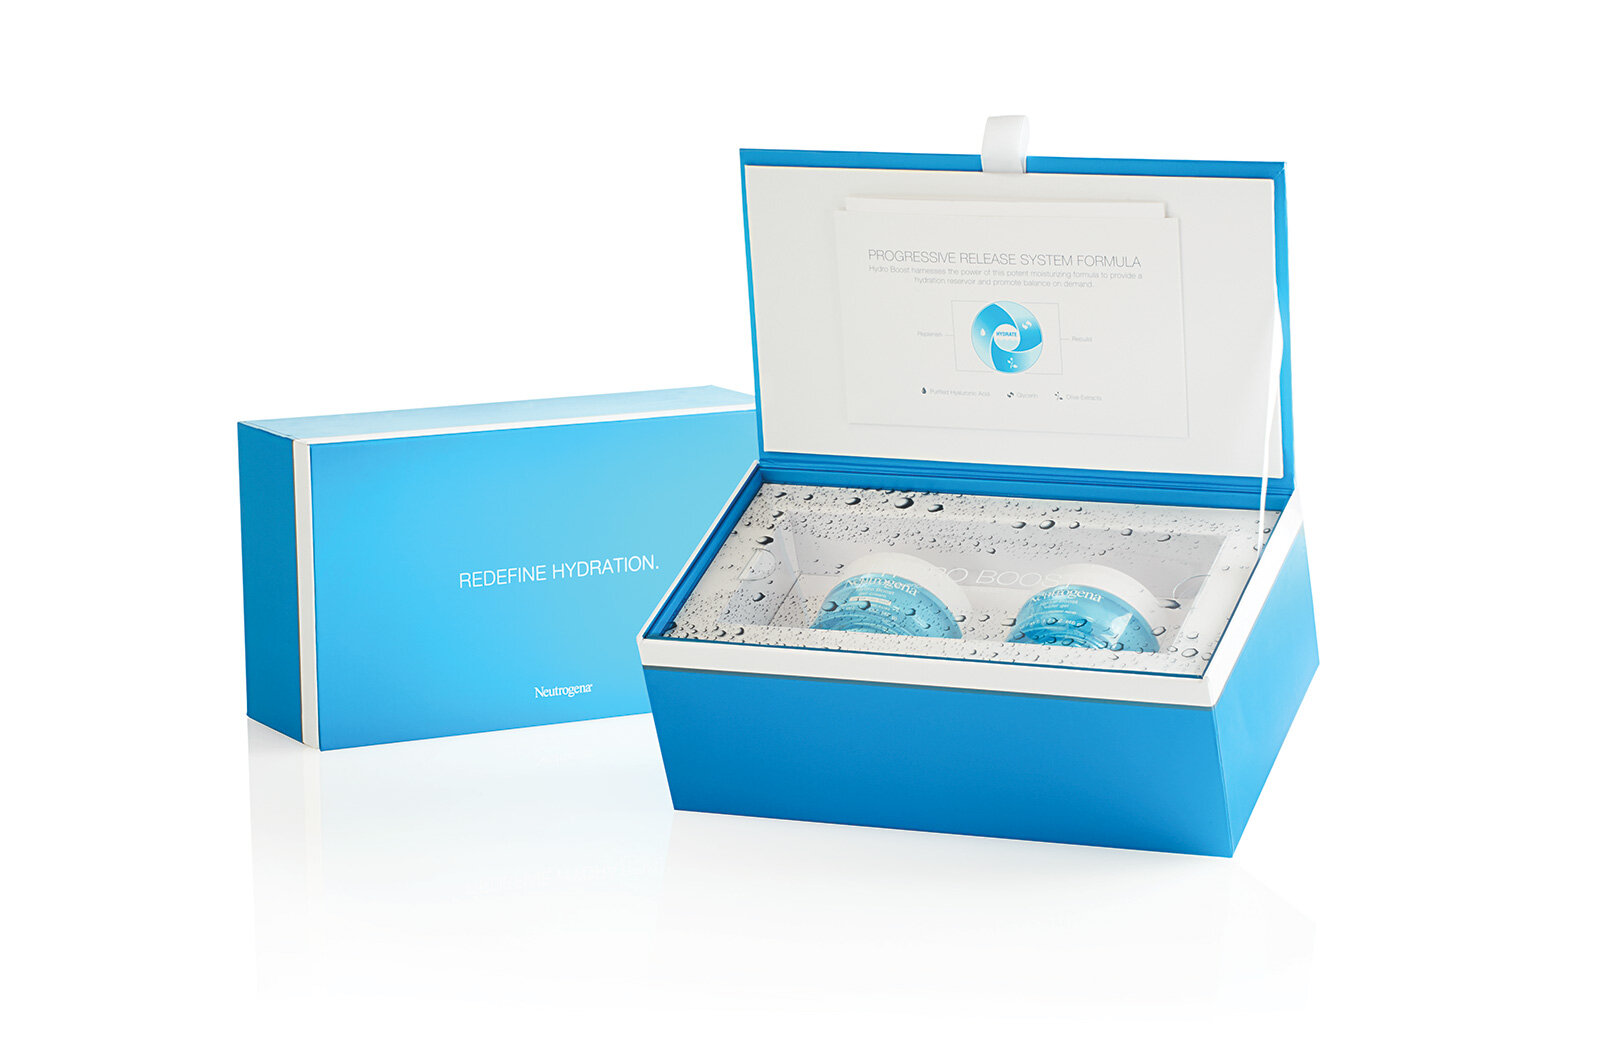 NuelErgena-Hydro-Boost-Box-化妆品包装公司 - 设计-6.JPG